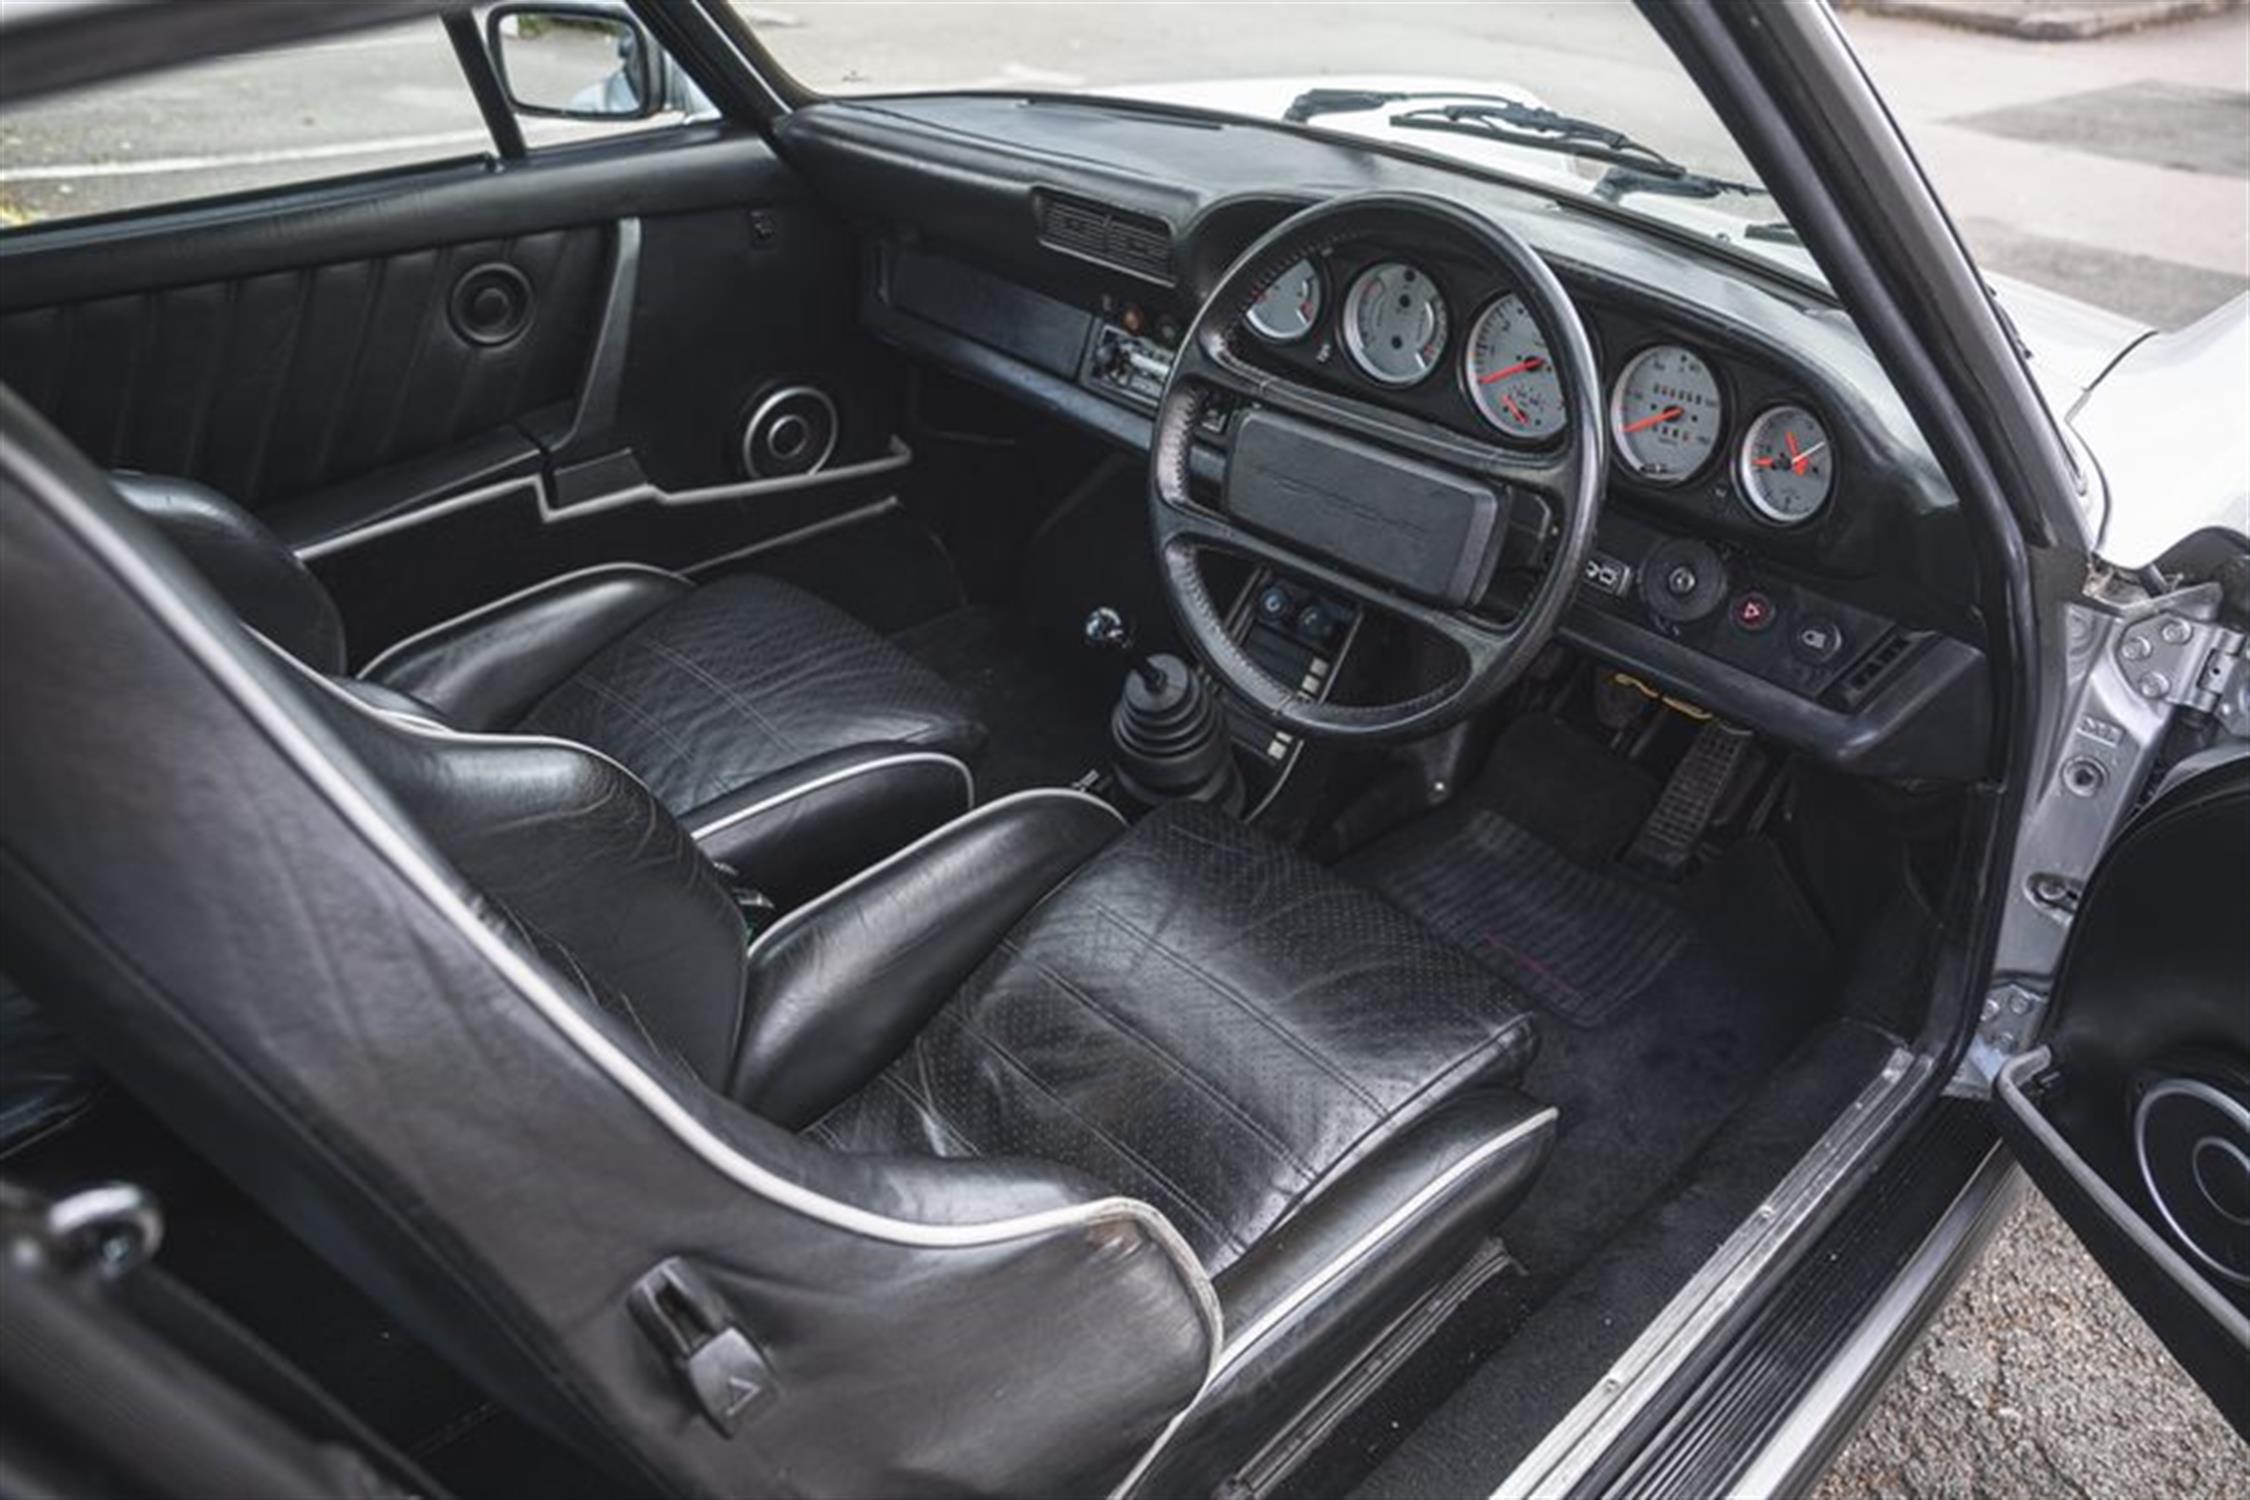 1979 Porsche 911 Turbo 3.3-Litre - Image 3 of 10